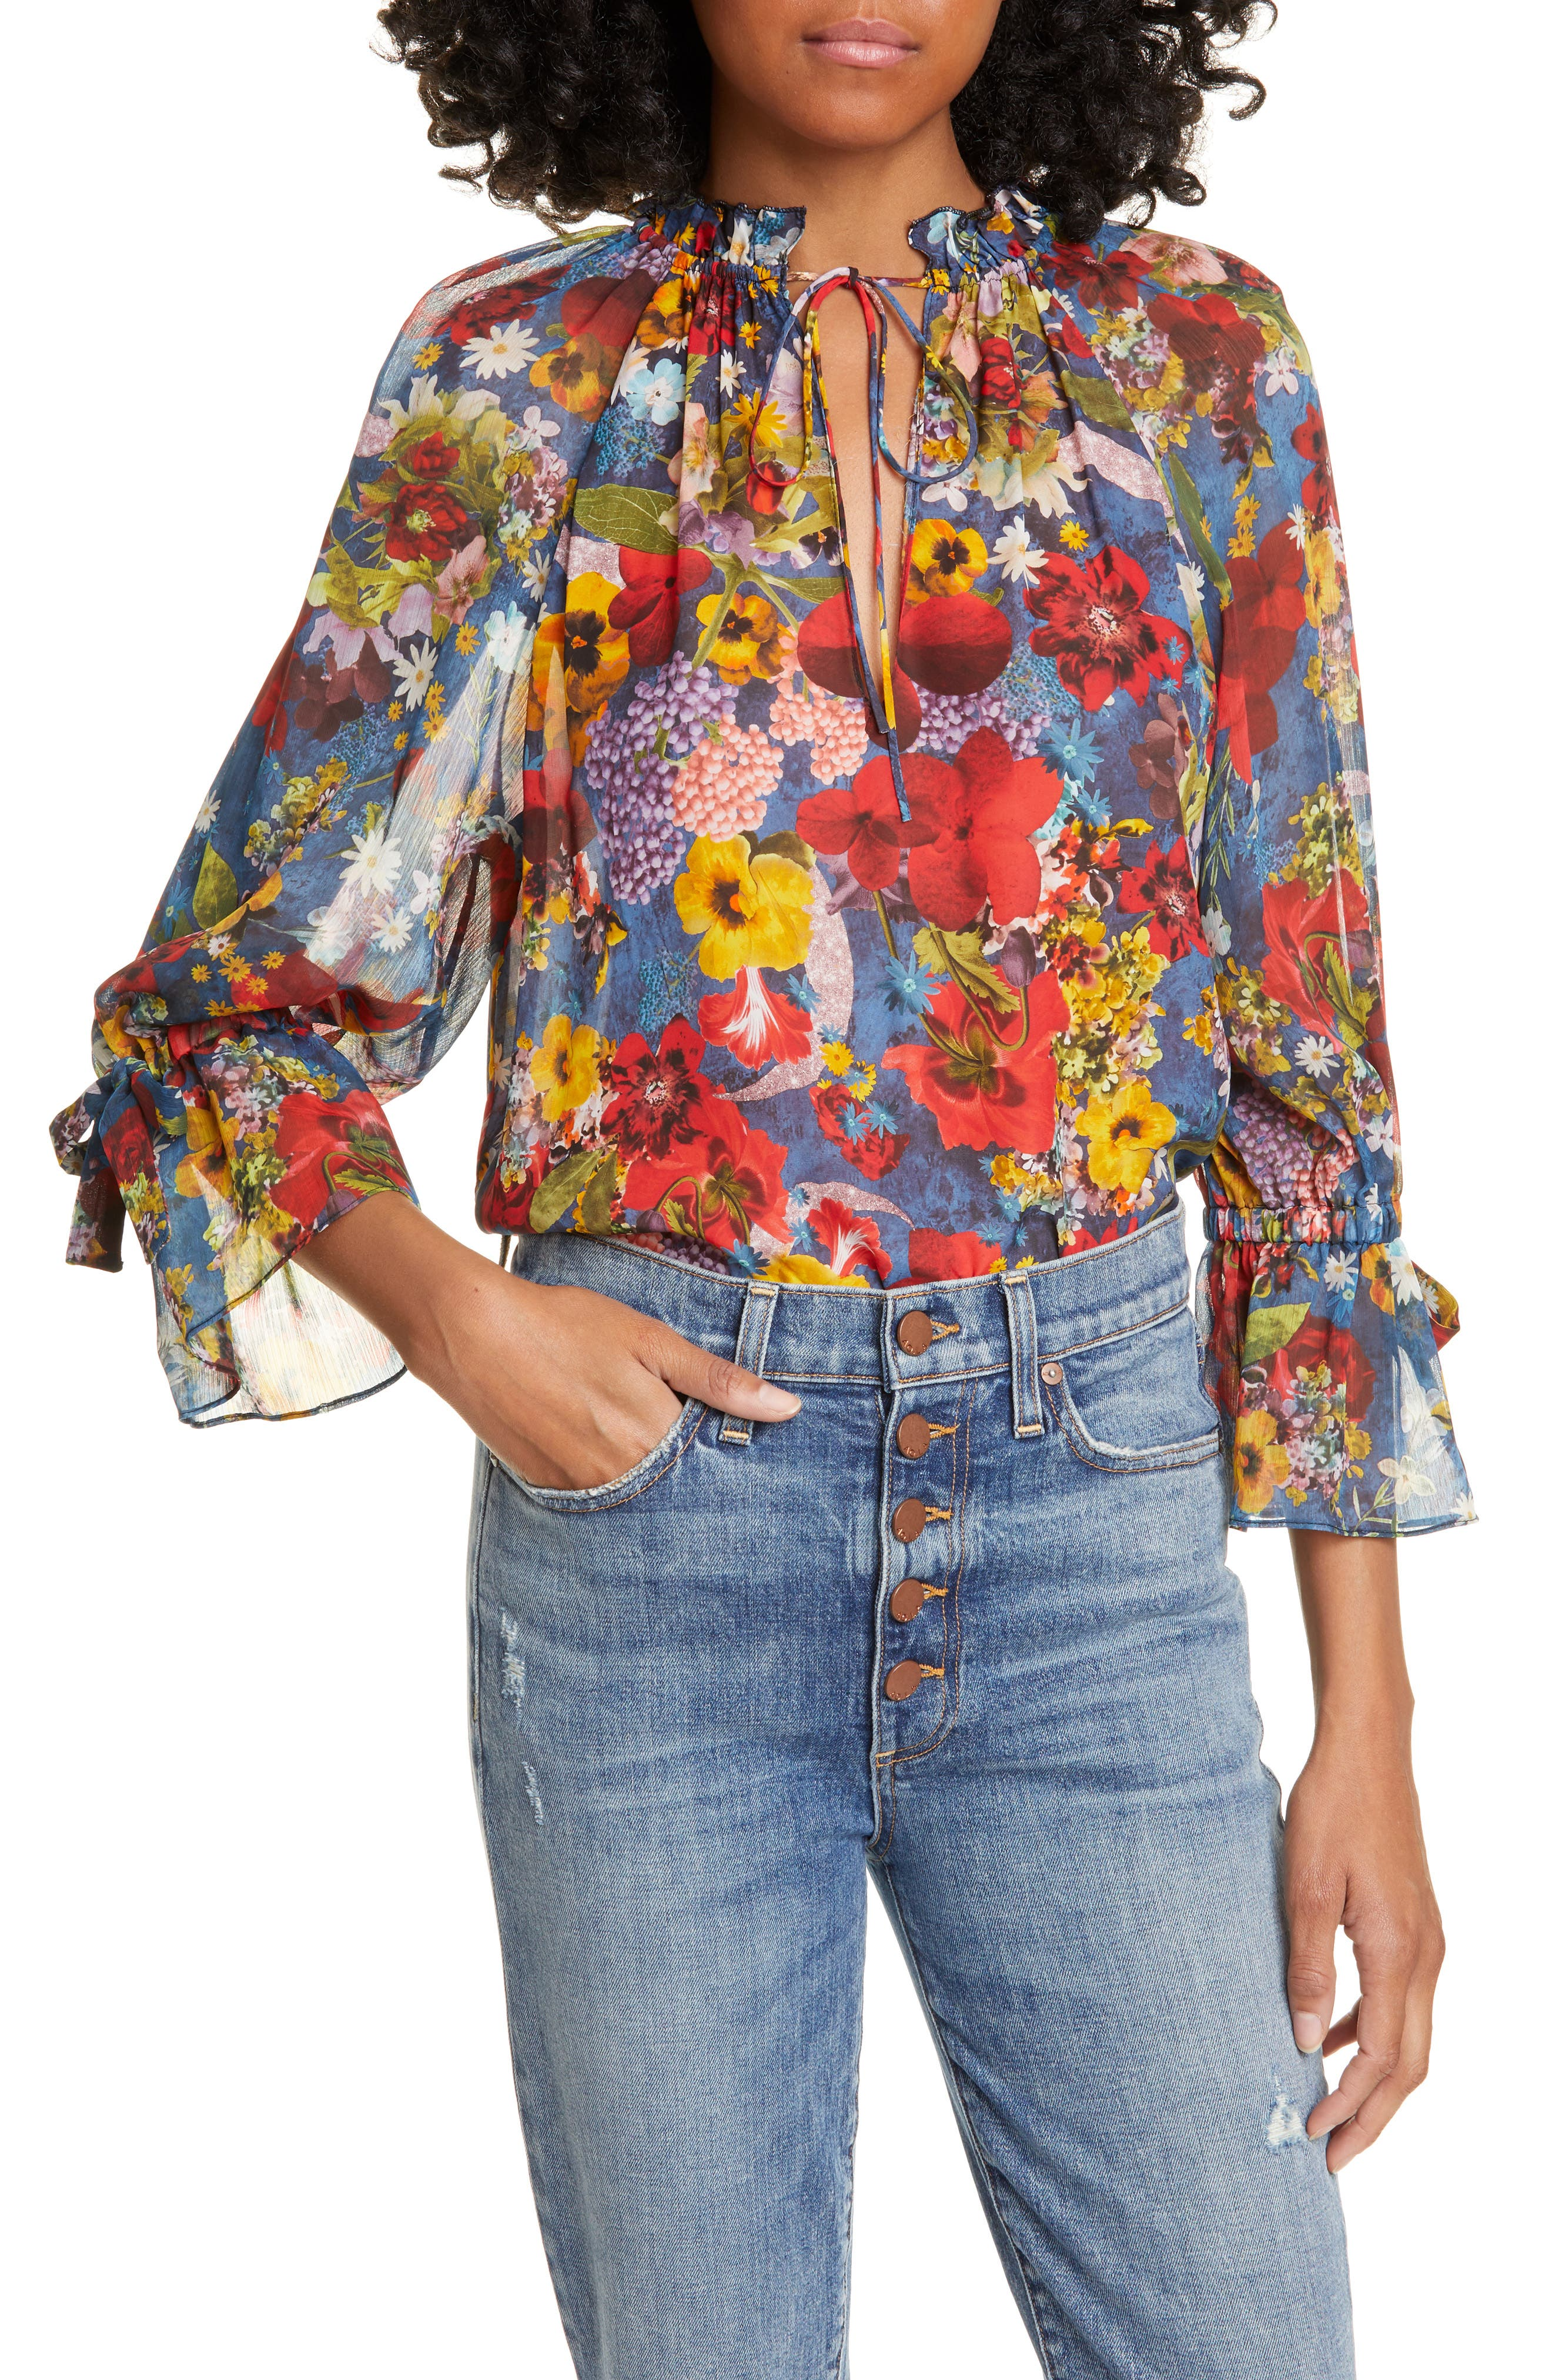 Women's 70s Shirts, Blouses, Hippie Tops Womens Alice  Olivia Julius Floral Print Raglan Sleeve Blouson Tunic $265.00 AT vintagedancer.com